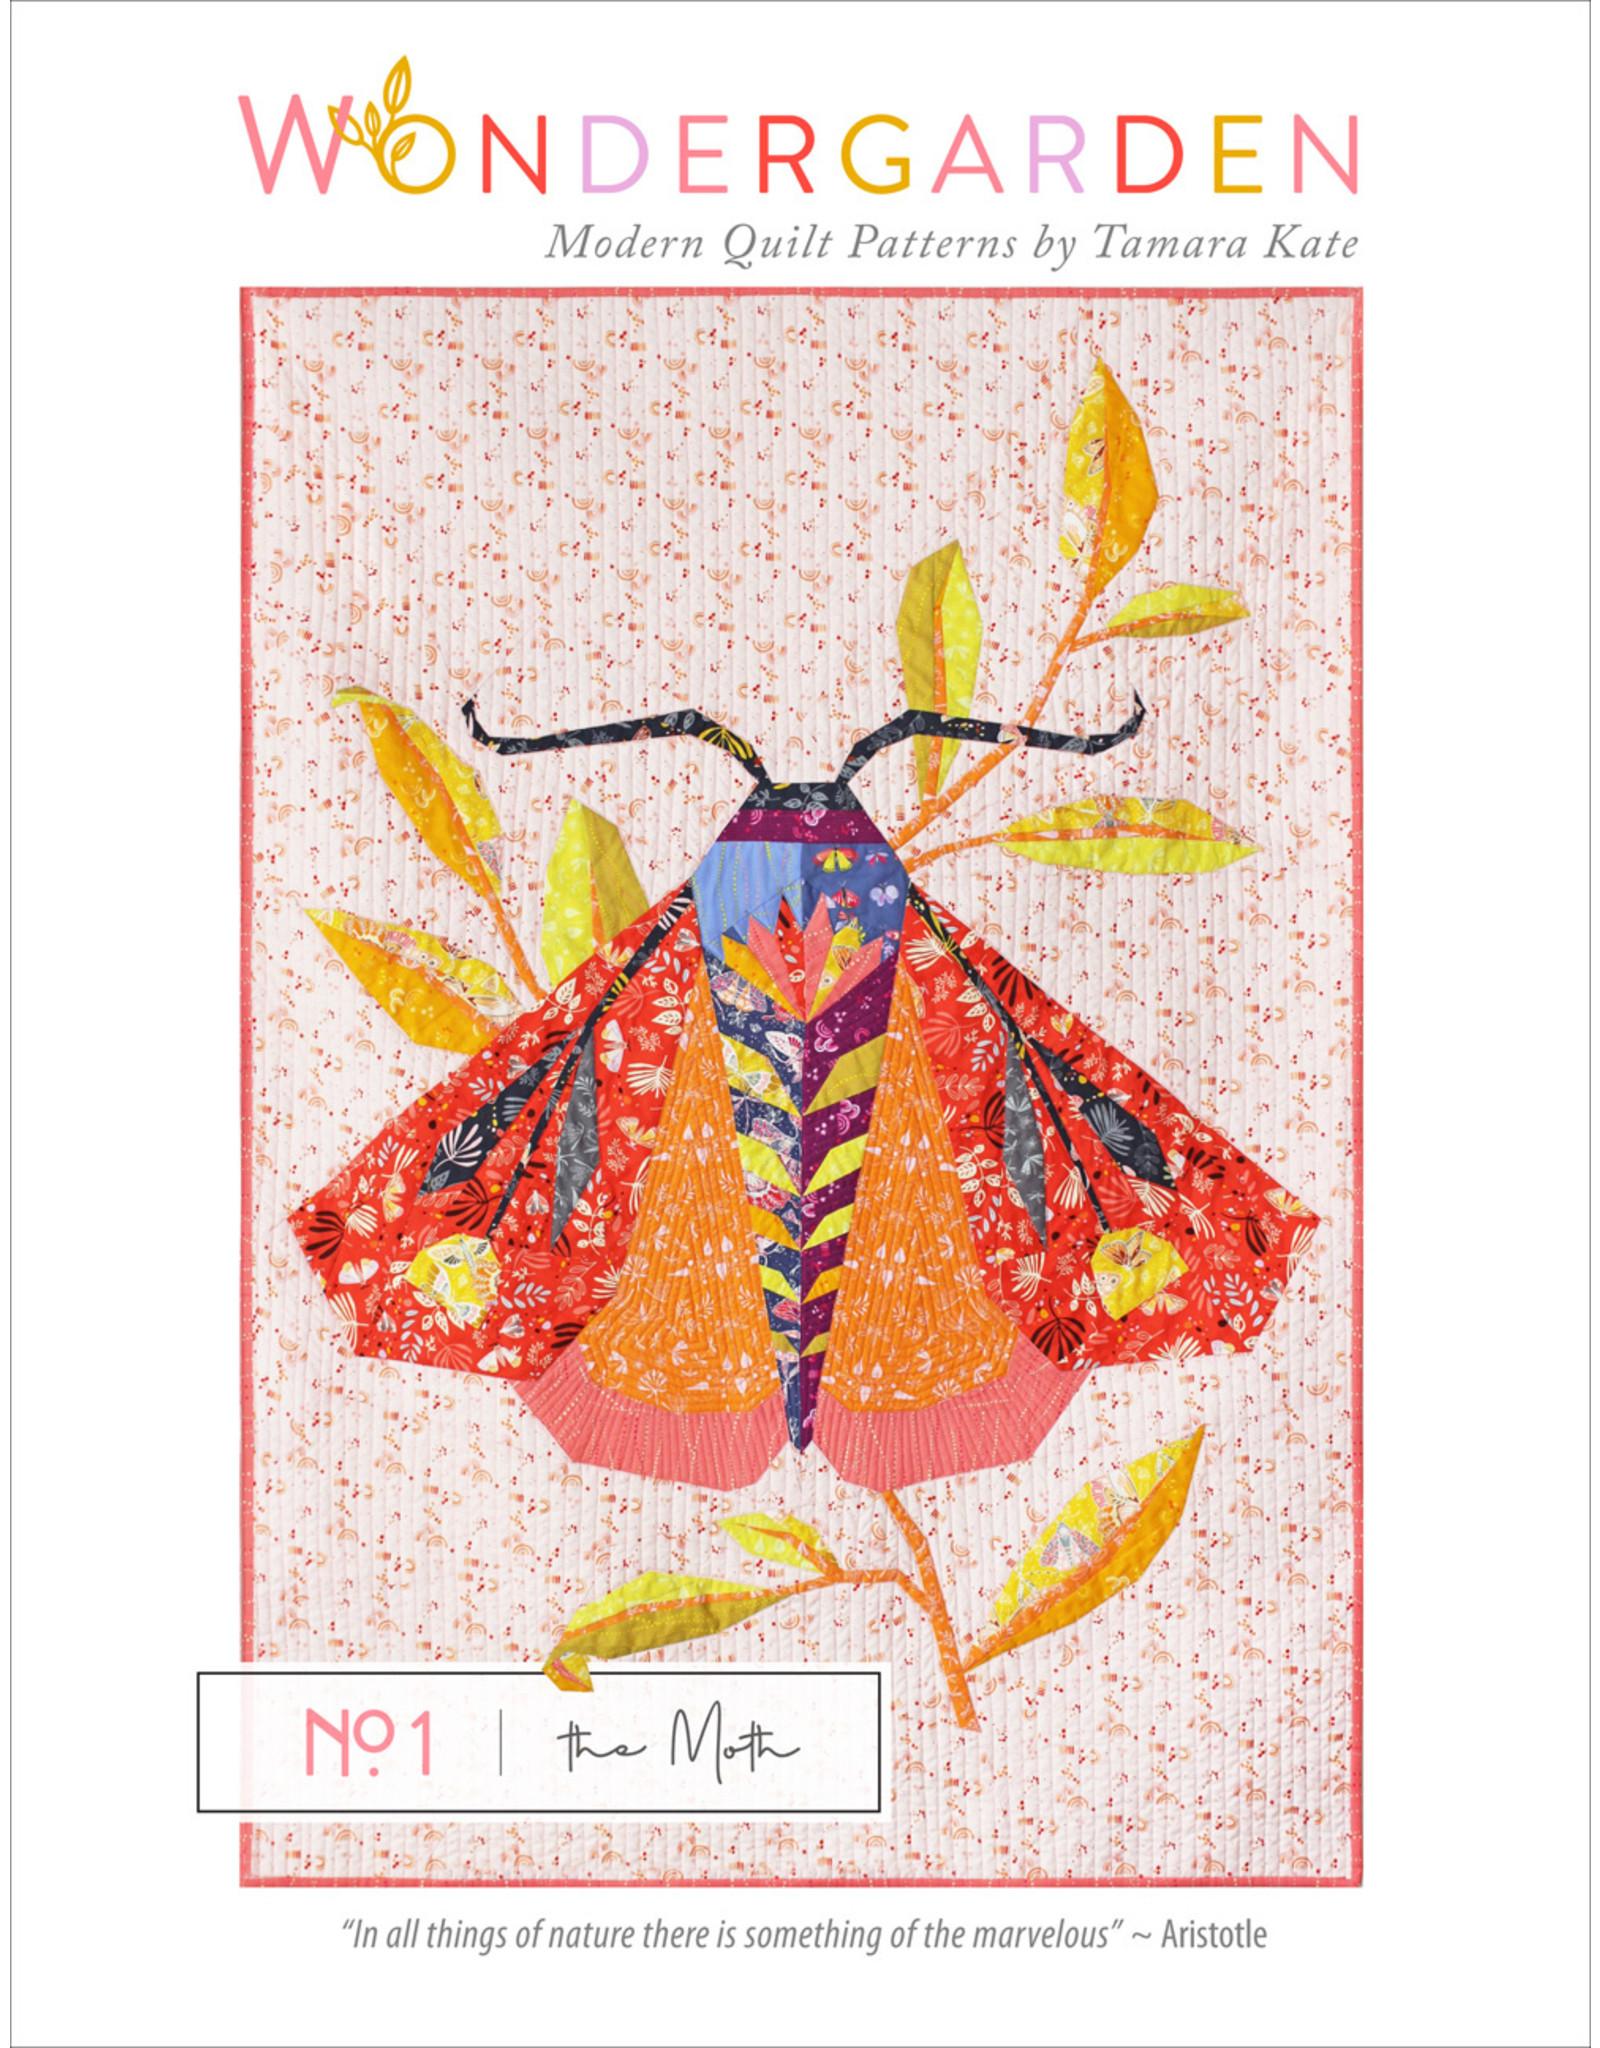 Windham Wondergarden - The Moth - Stoffenpakket